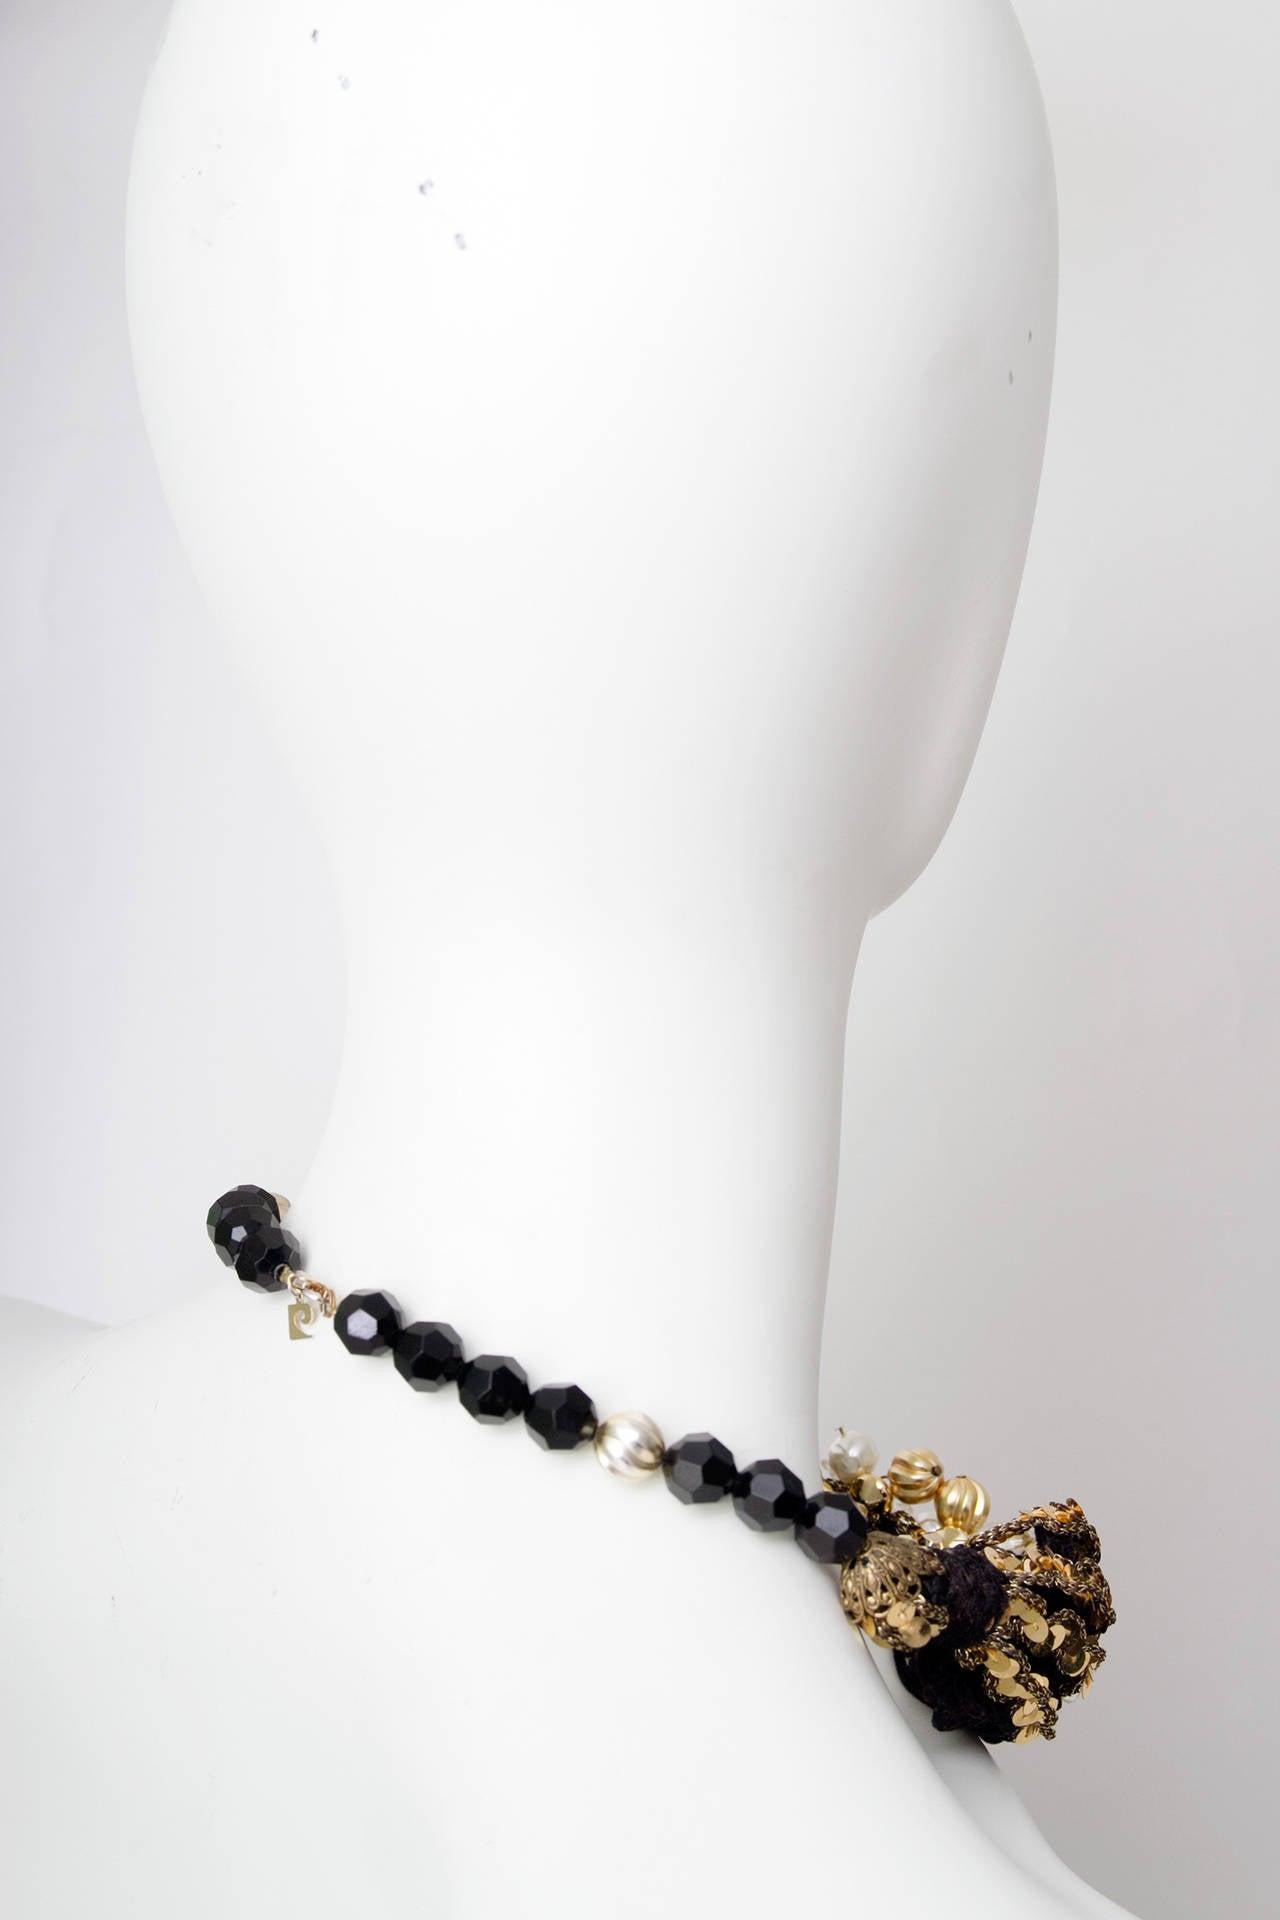 70s Pierre Cardin Black Beads & Gold Sequin Necklace 5